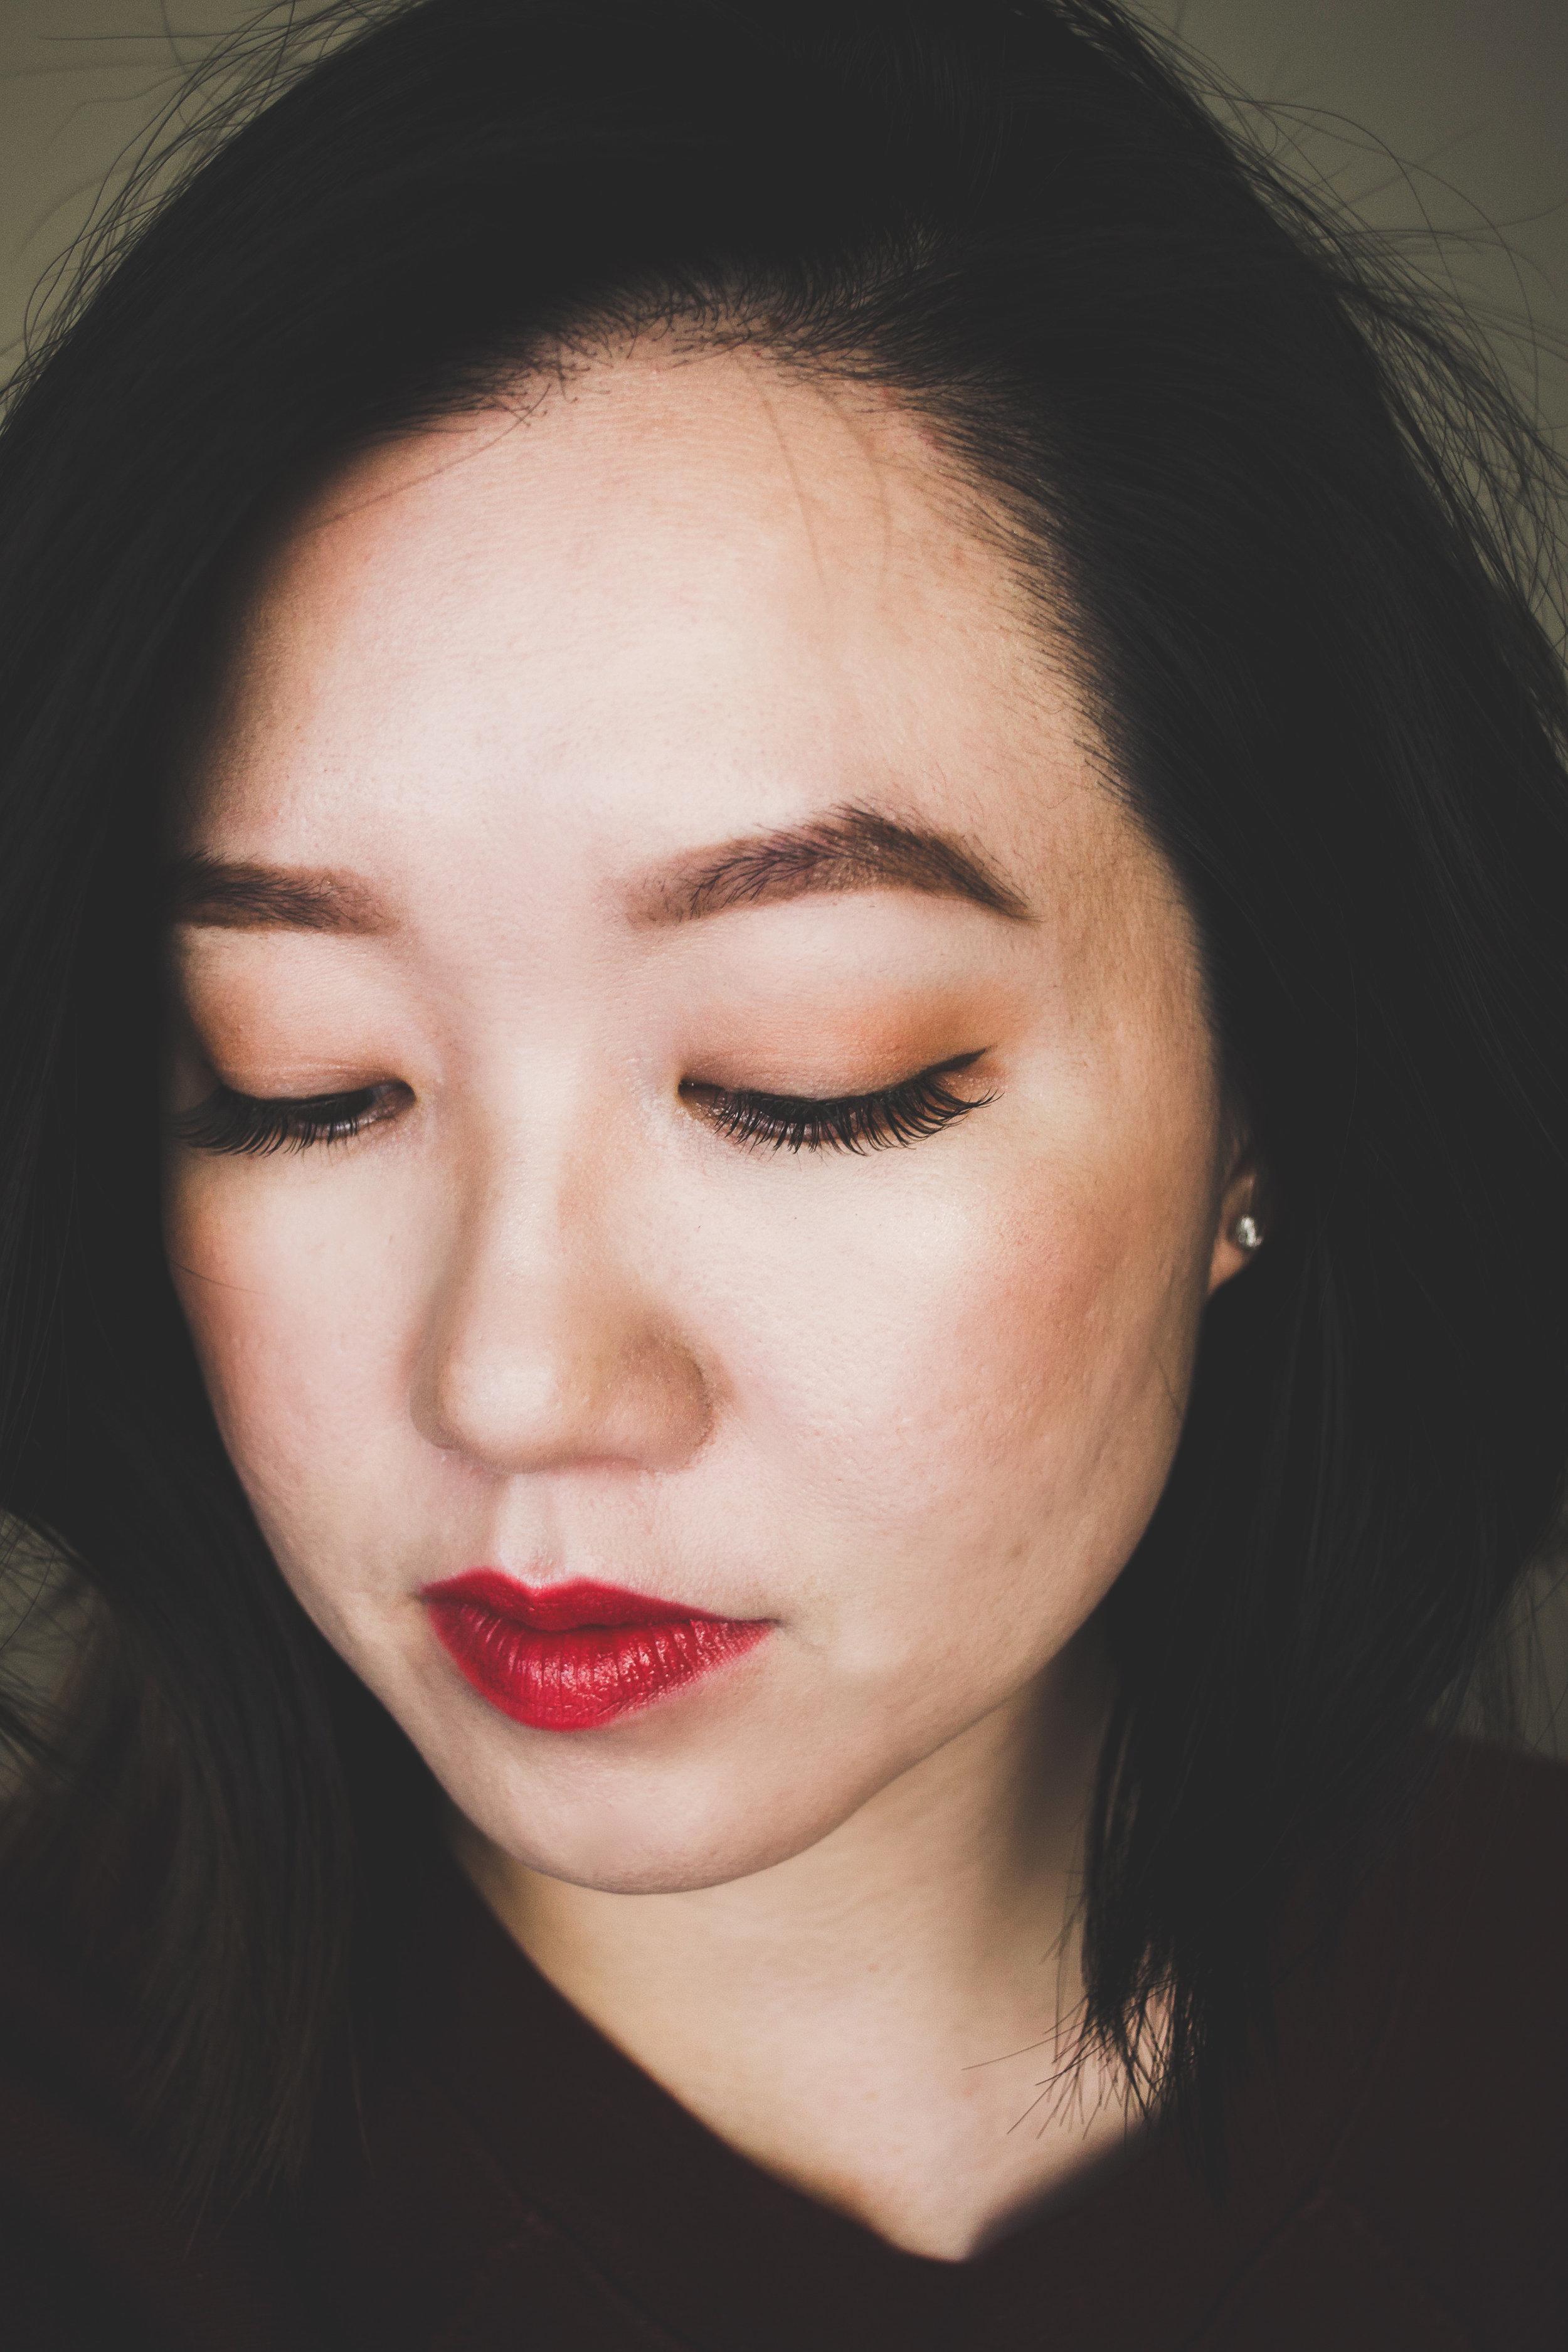 false lashes for asian eyes miche bloomin_DSC_2939-2.jpg